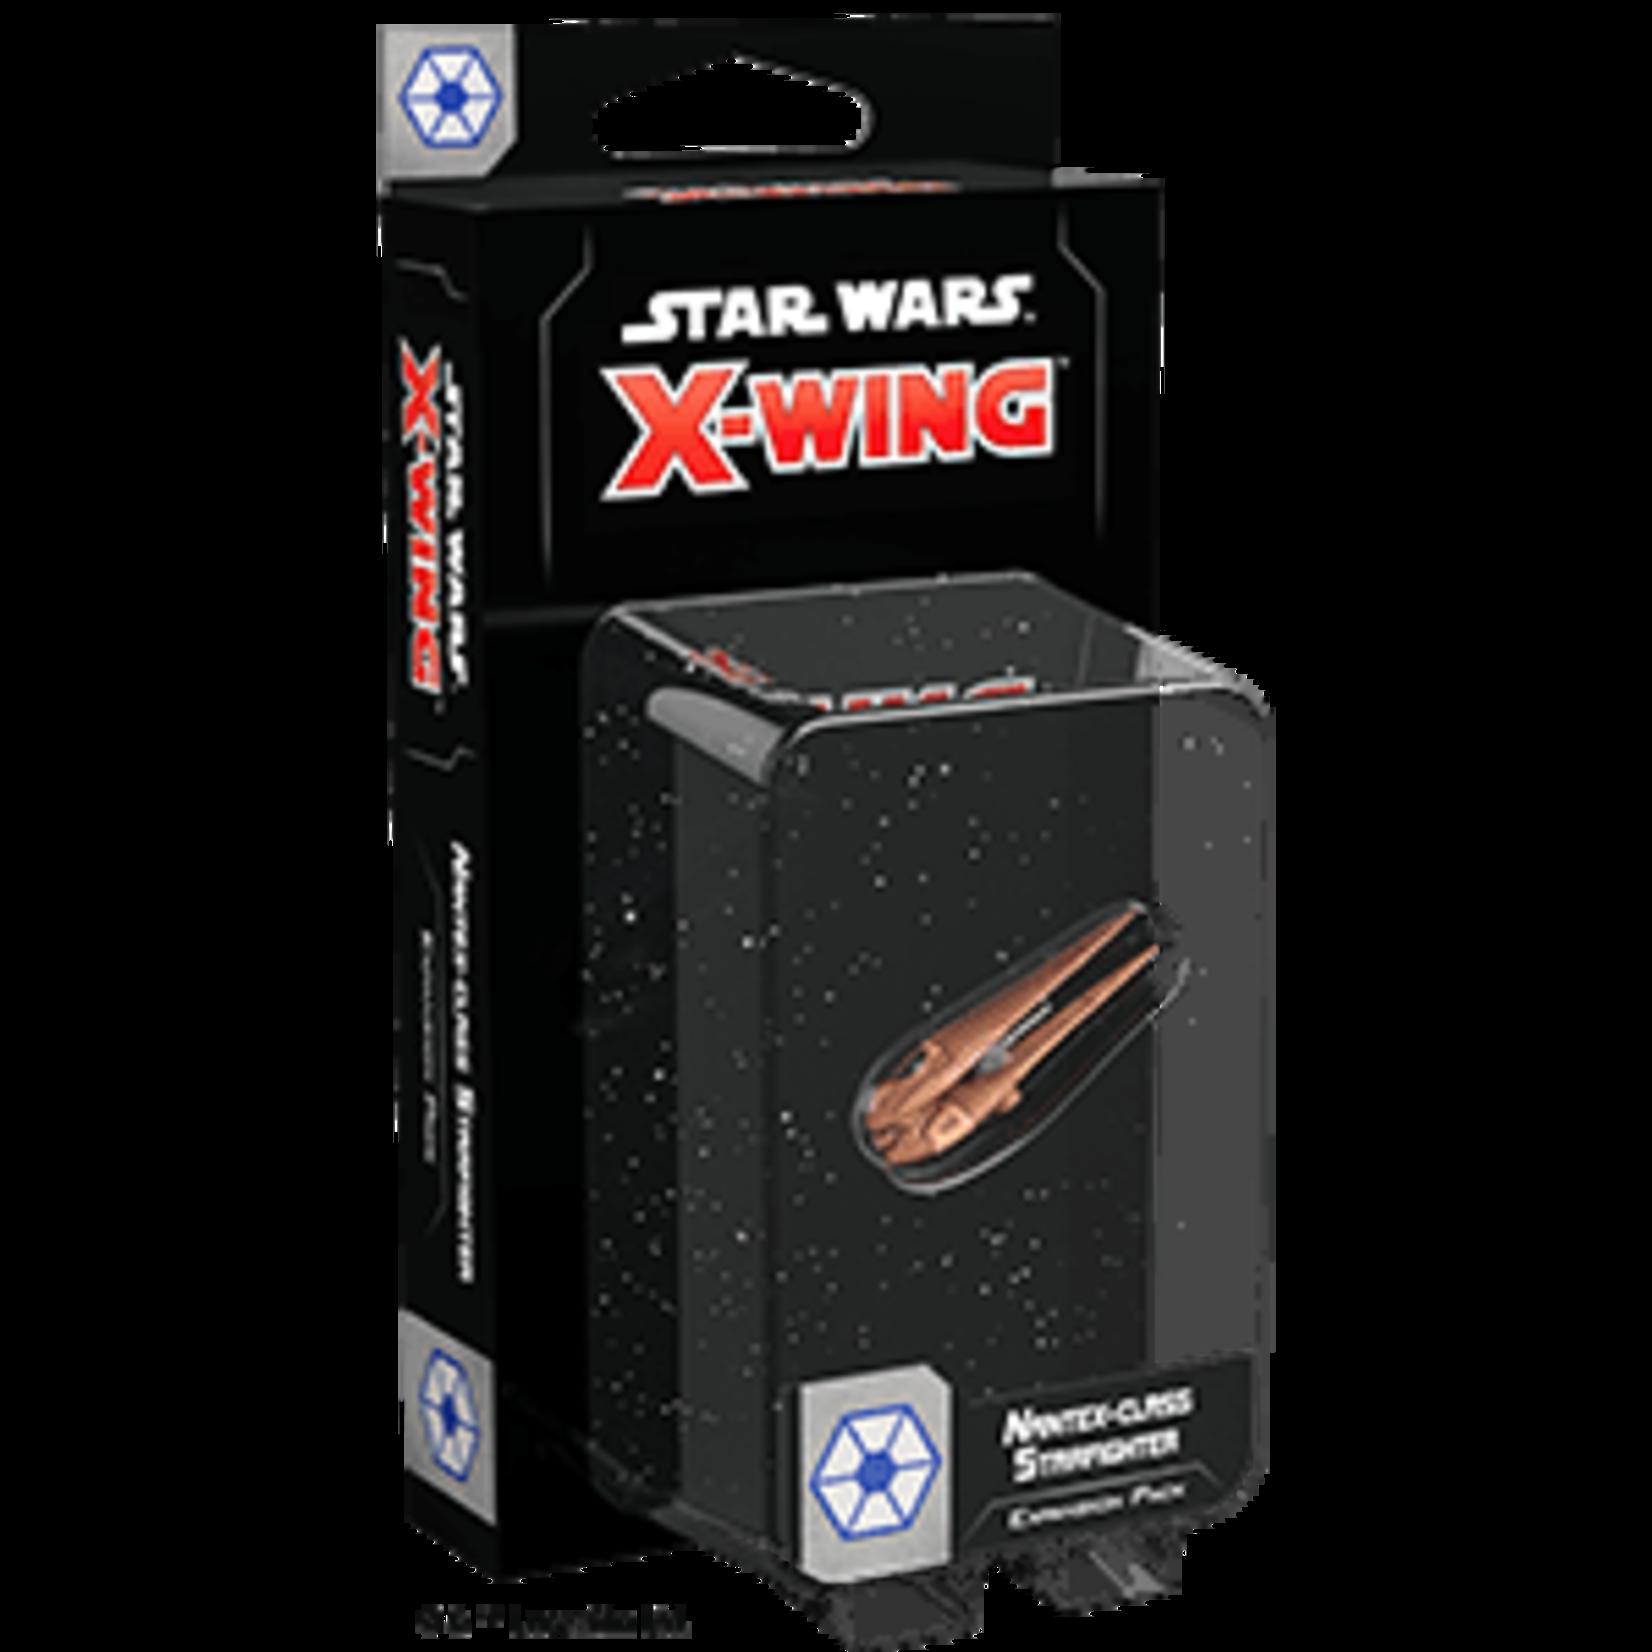 Star Wars X-Wing 2e: Nantex-Class Starfighter Expansion Pack